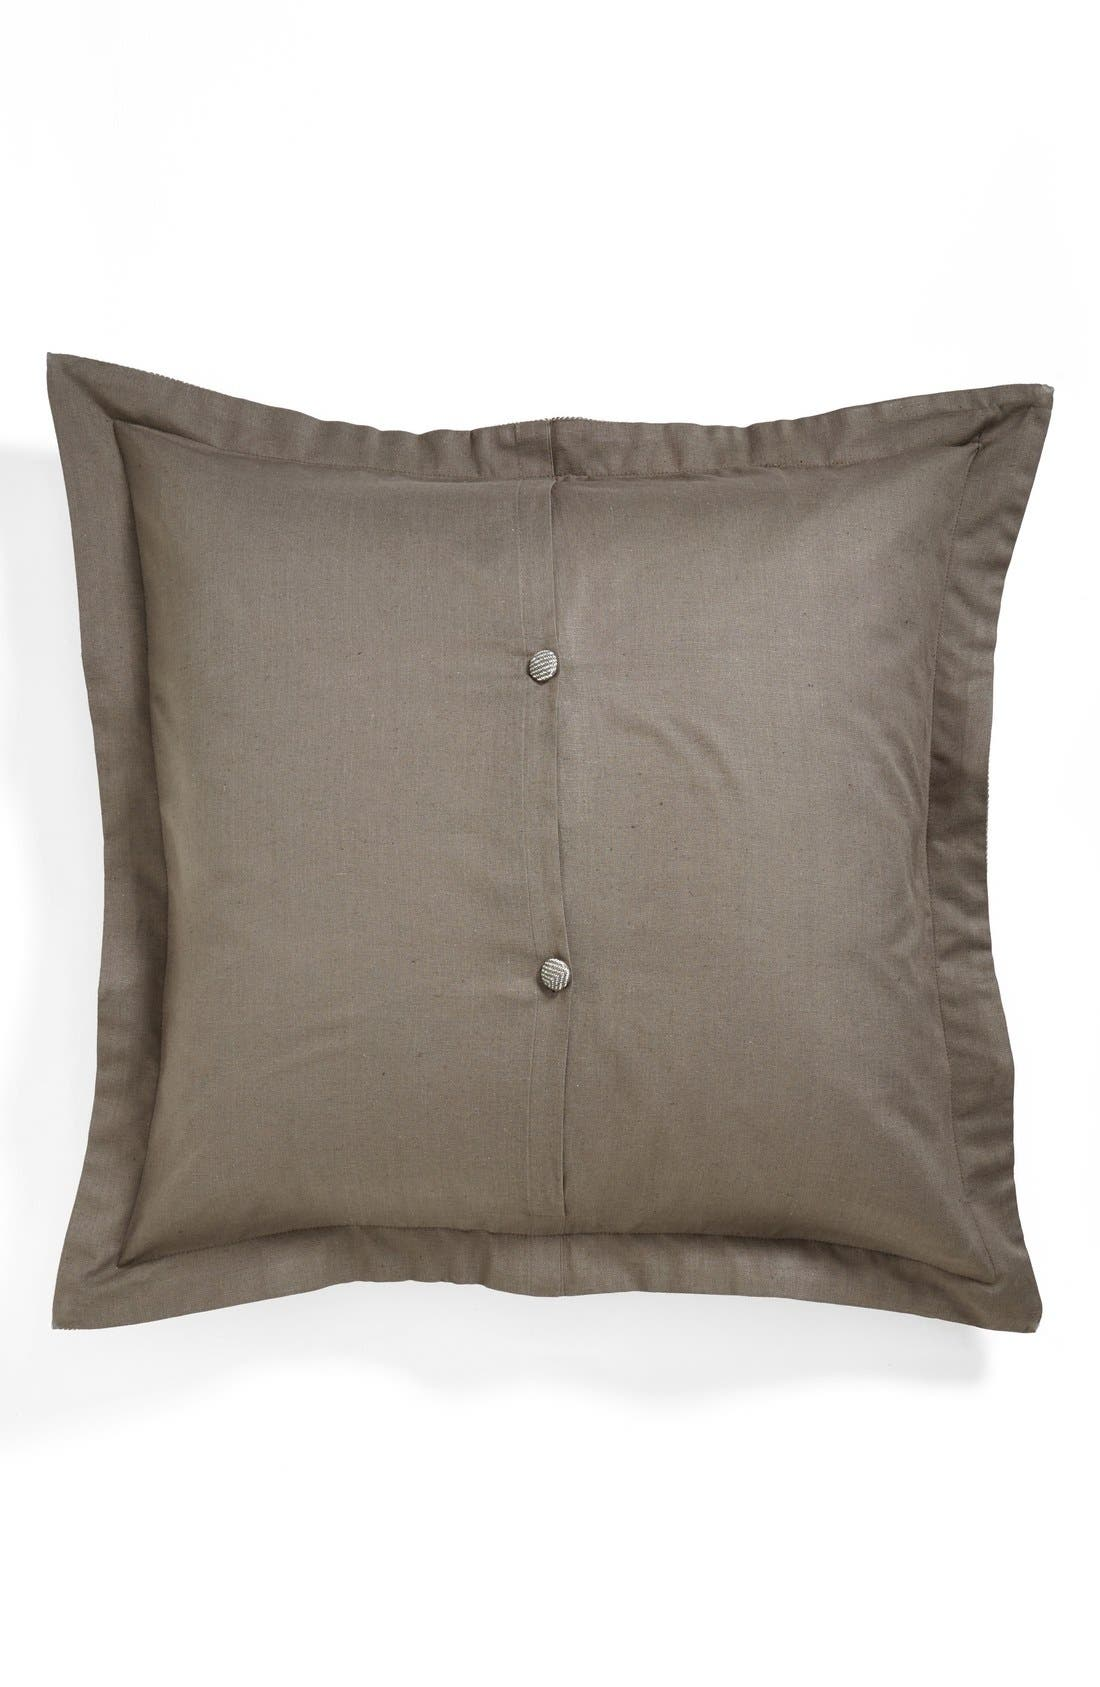 Alternate Image 2  - Amity Home 'Logan' Euro Pillow Sham